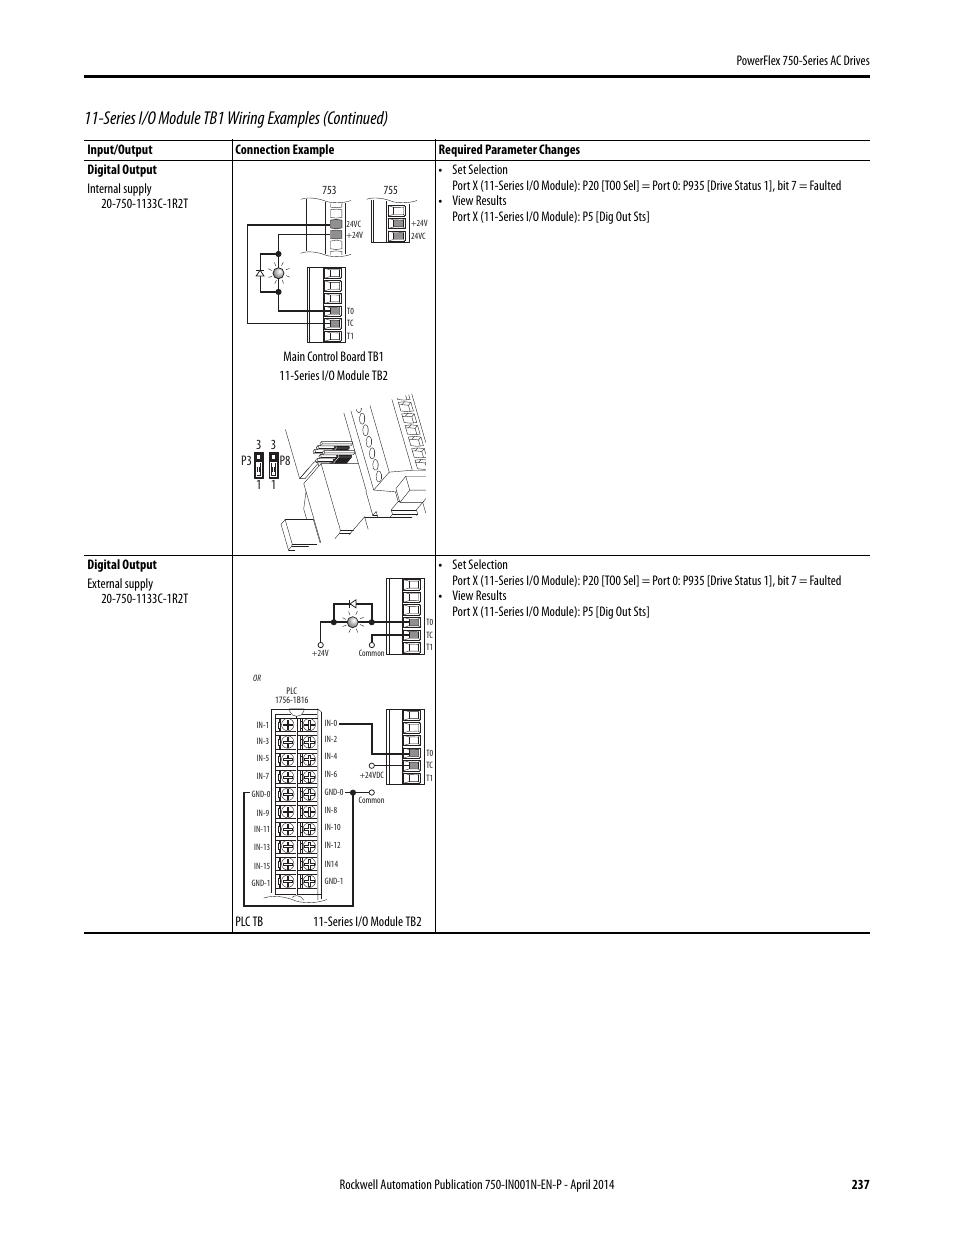 ac drive wiring diagram - wiring diagrams resources powerflex 753 control wiring diagram  lifeguide-ilona-thomsen.de